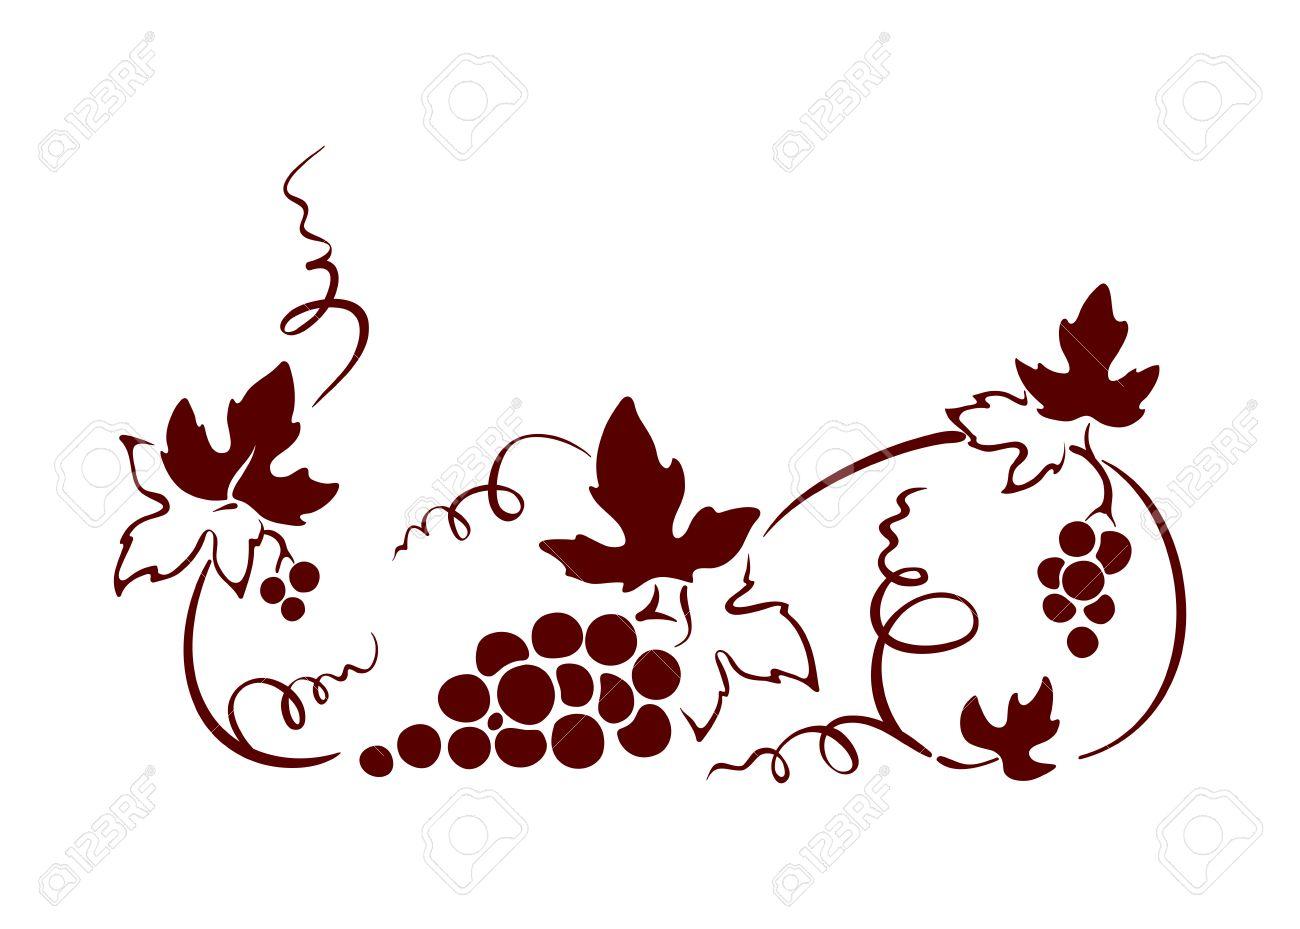 Design element, border -- vine. Graphic illustration. - 50386794